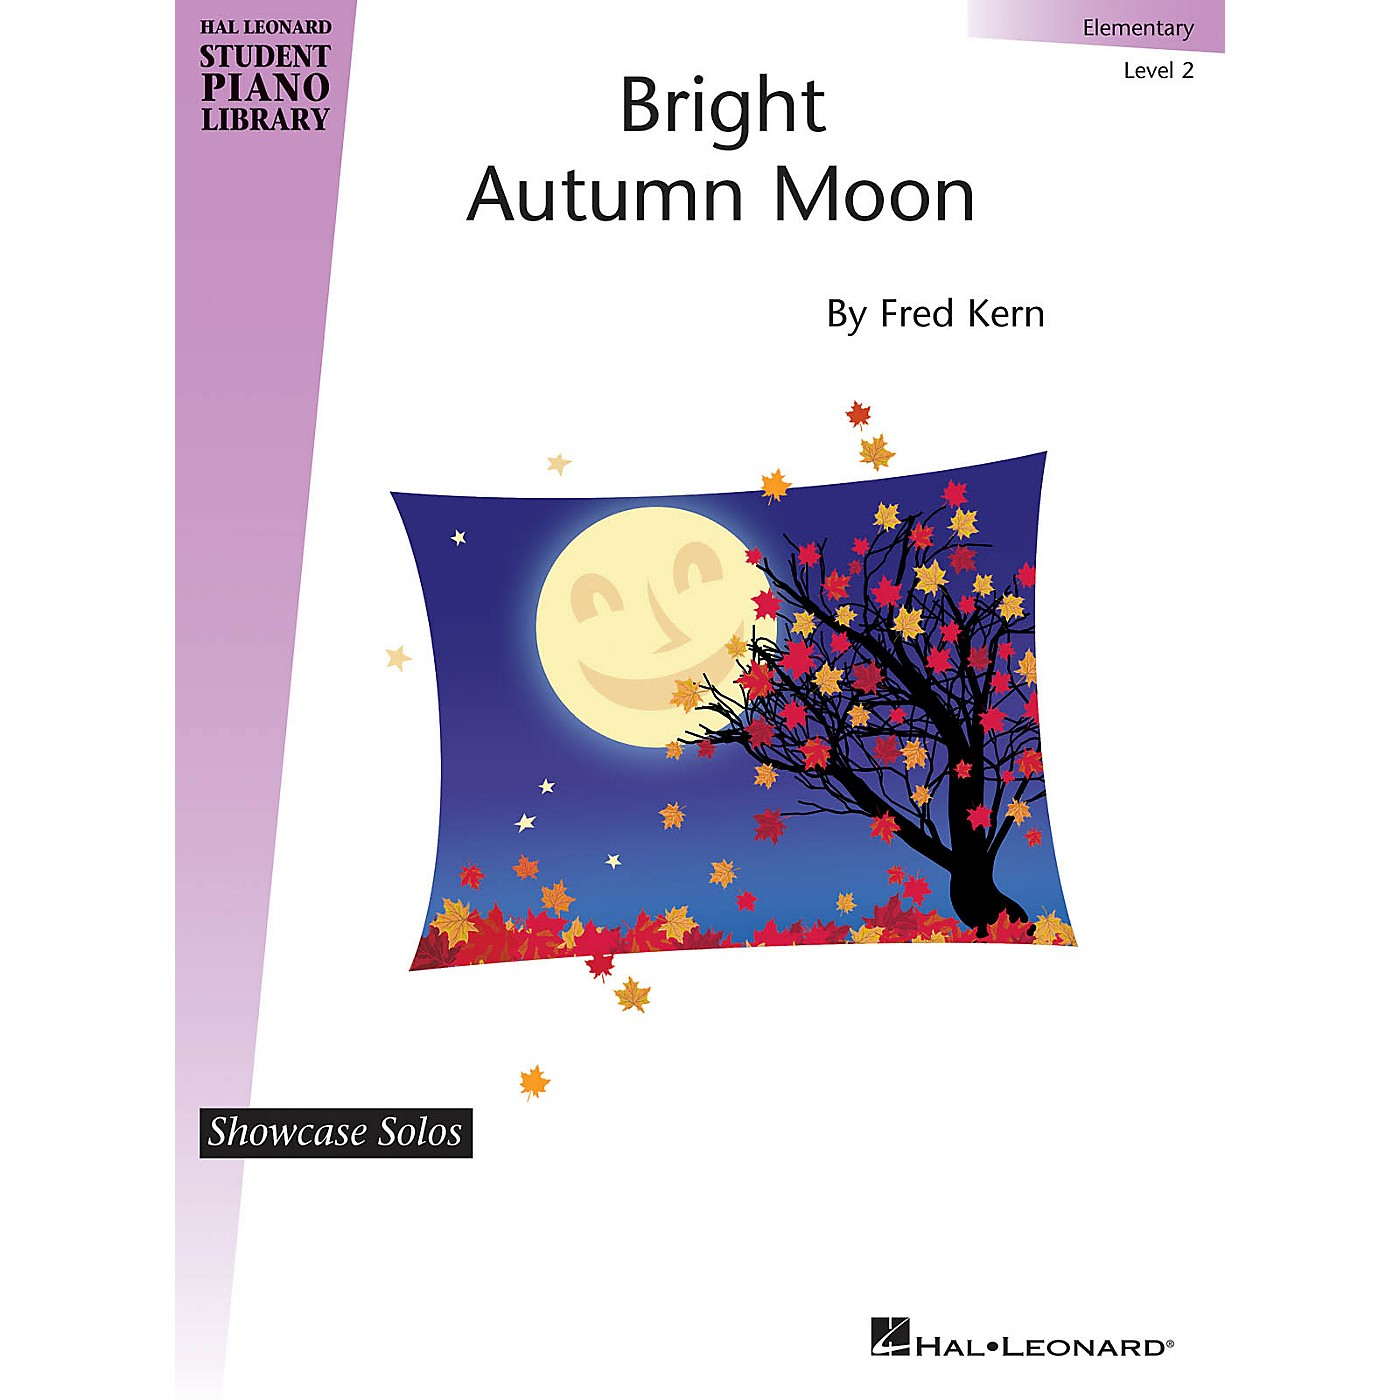 Hal Leonard Bright Autumn Moon Piano Library Series by Fred Kern (Level Elem) thumbnail